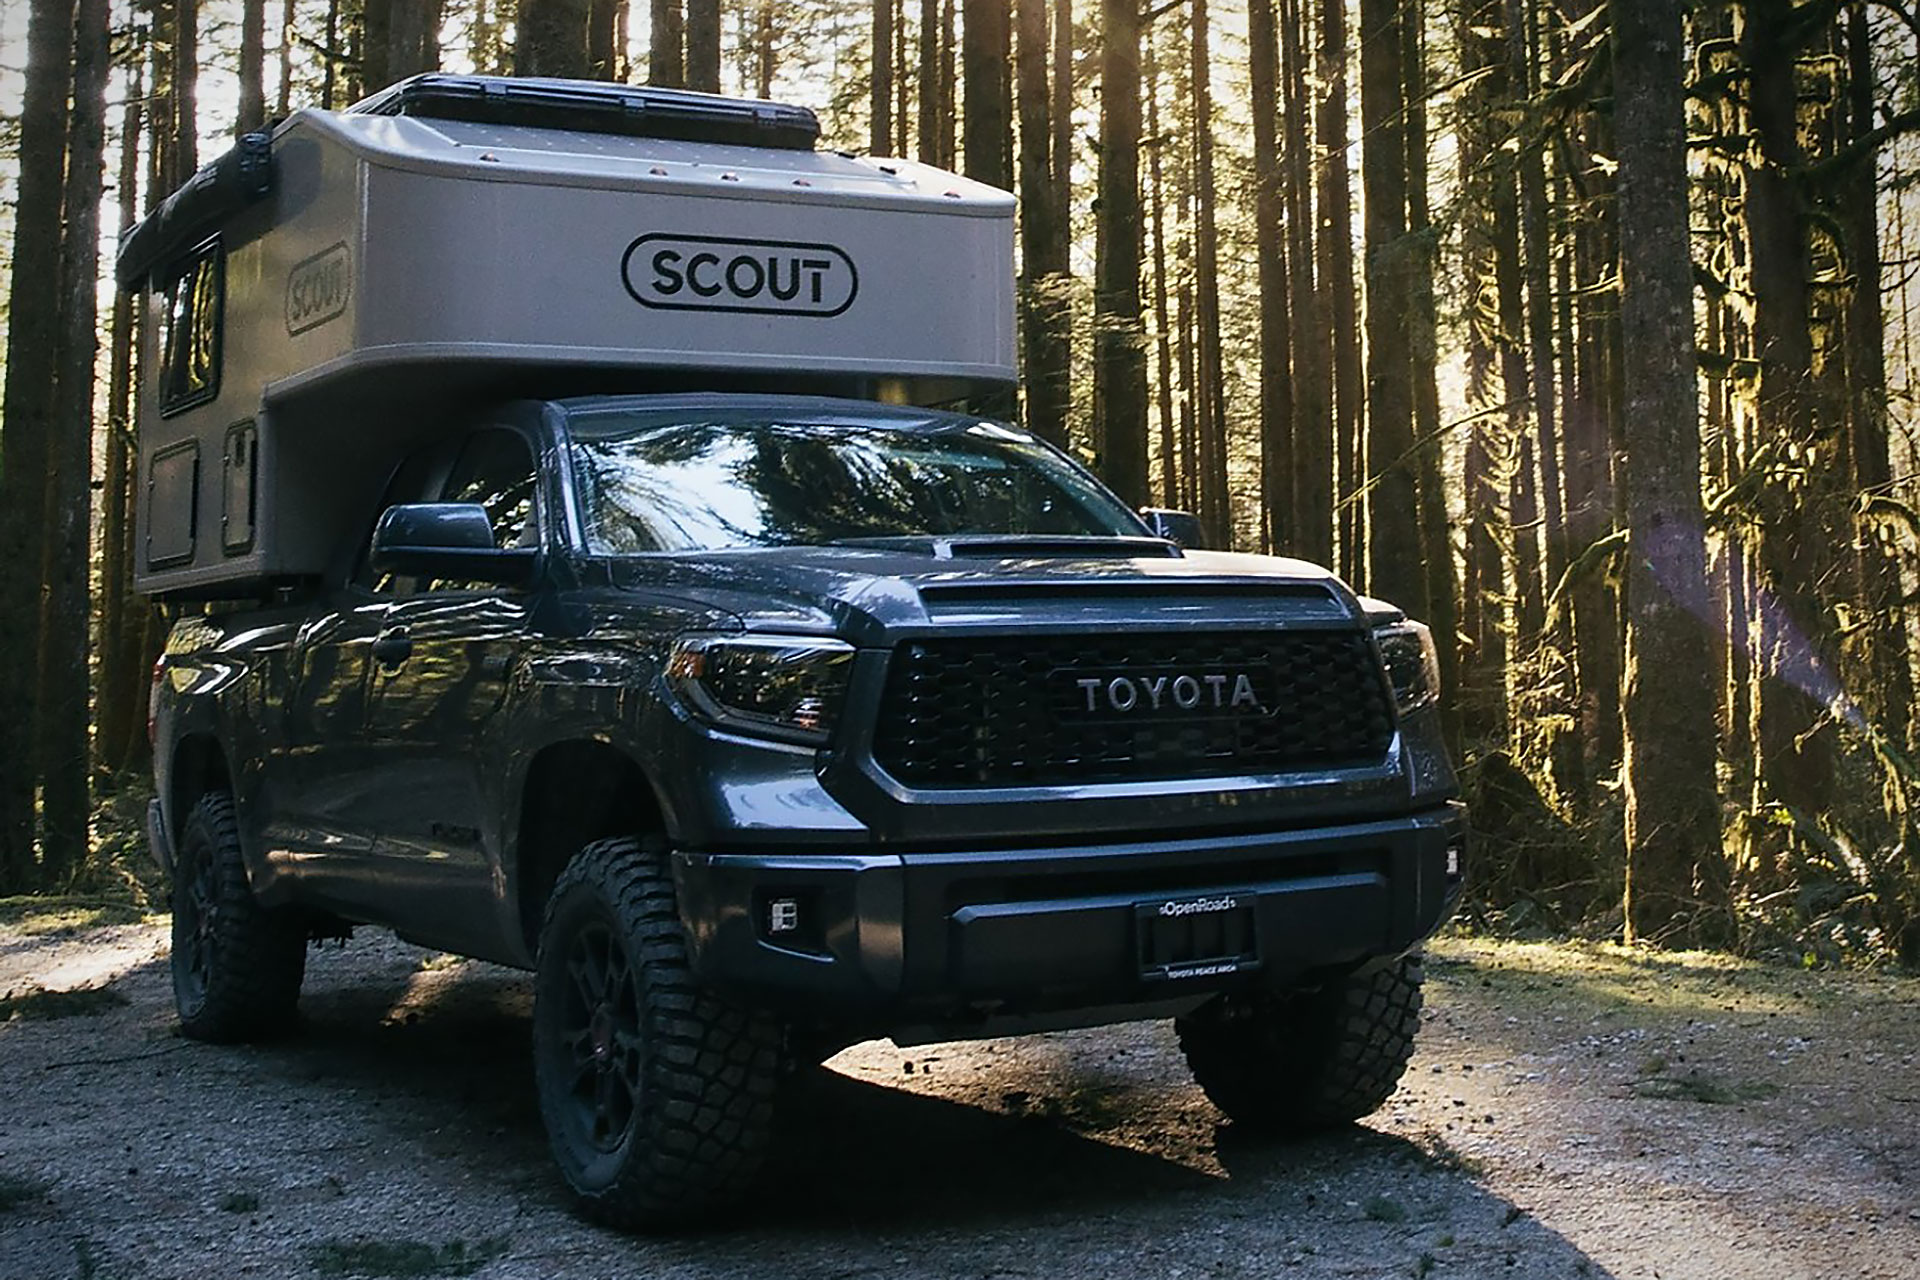 Scout Olympic Truck Camper